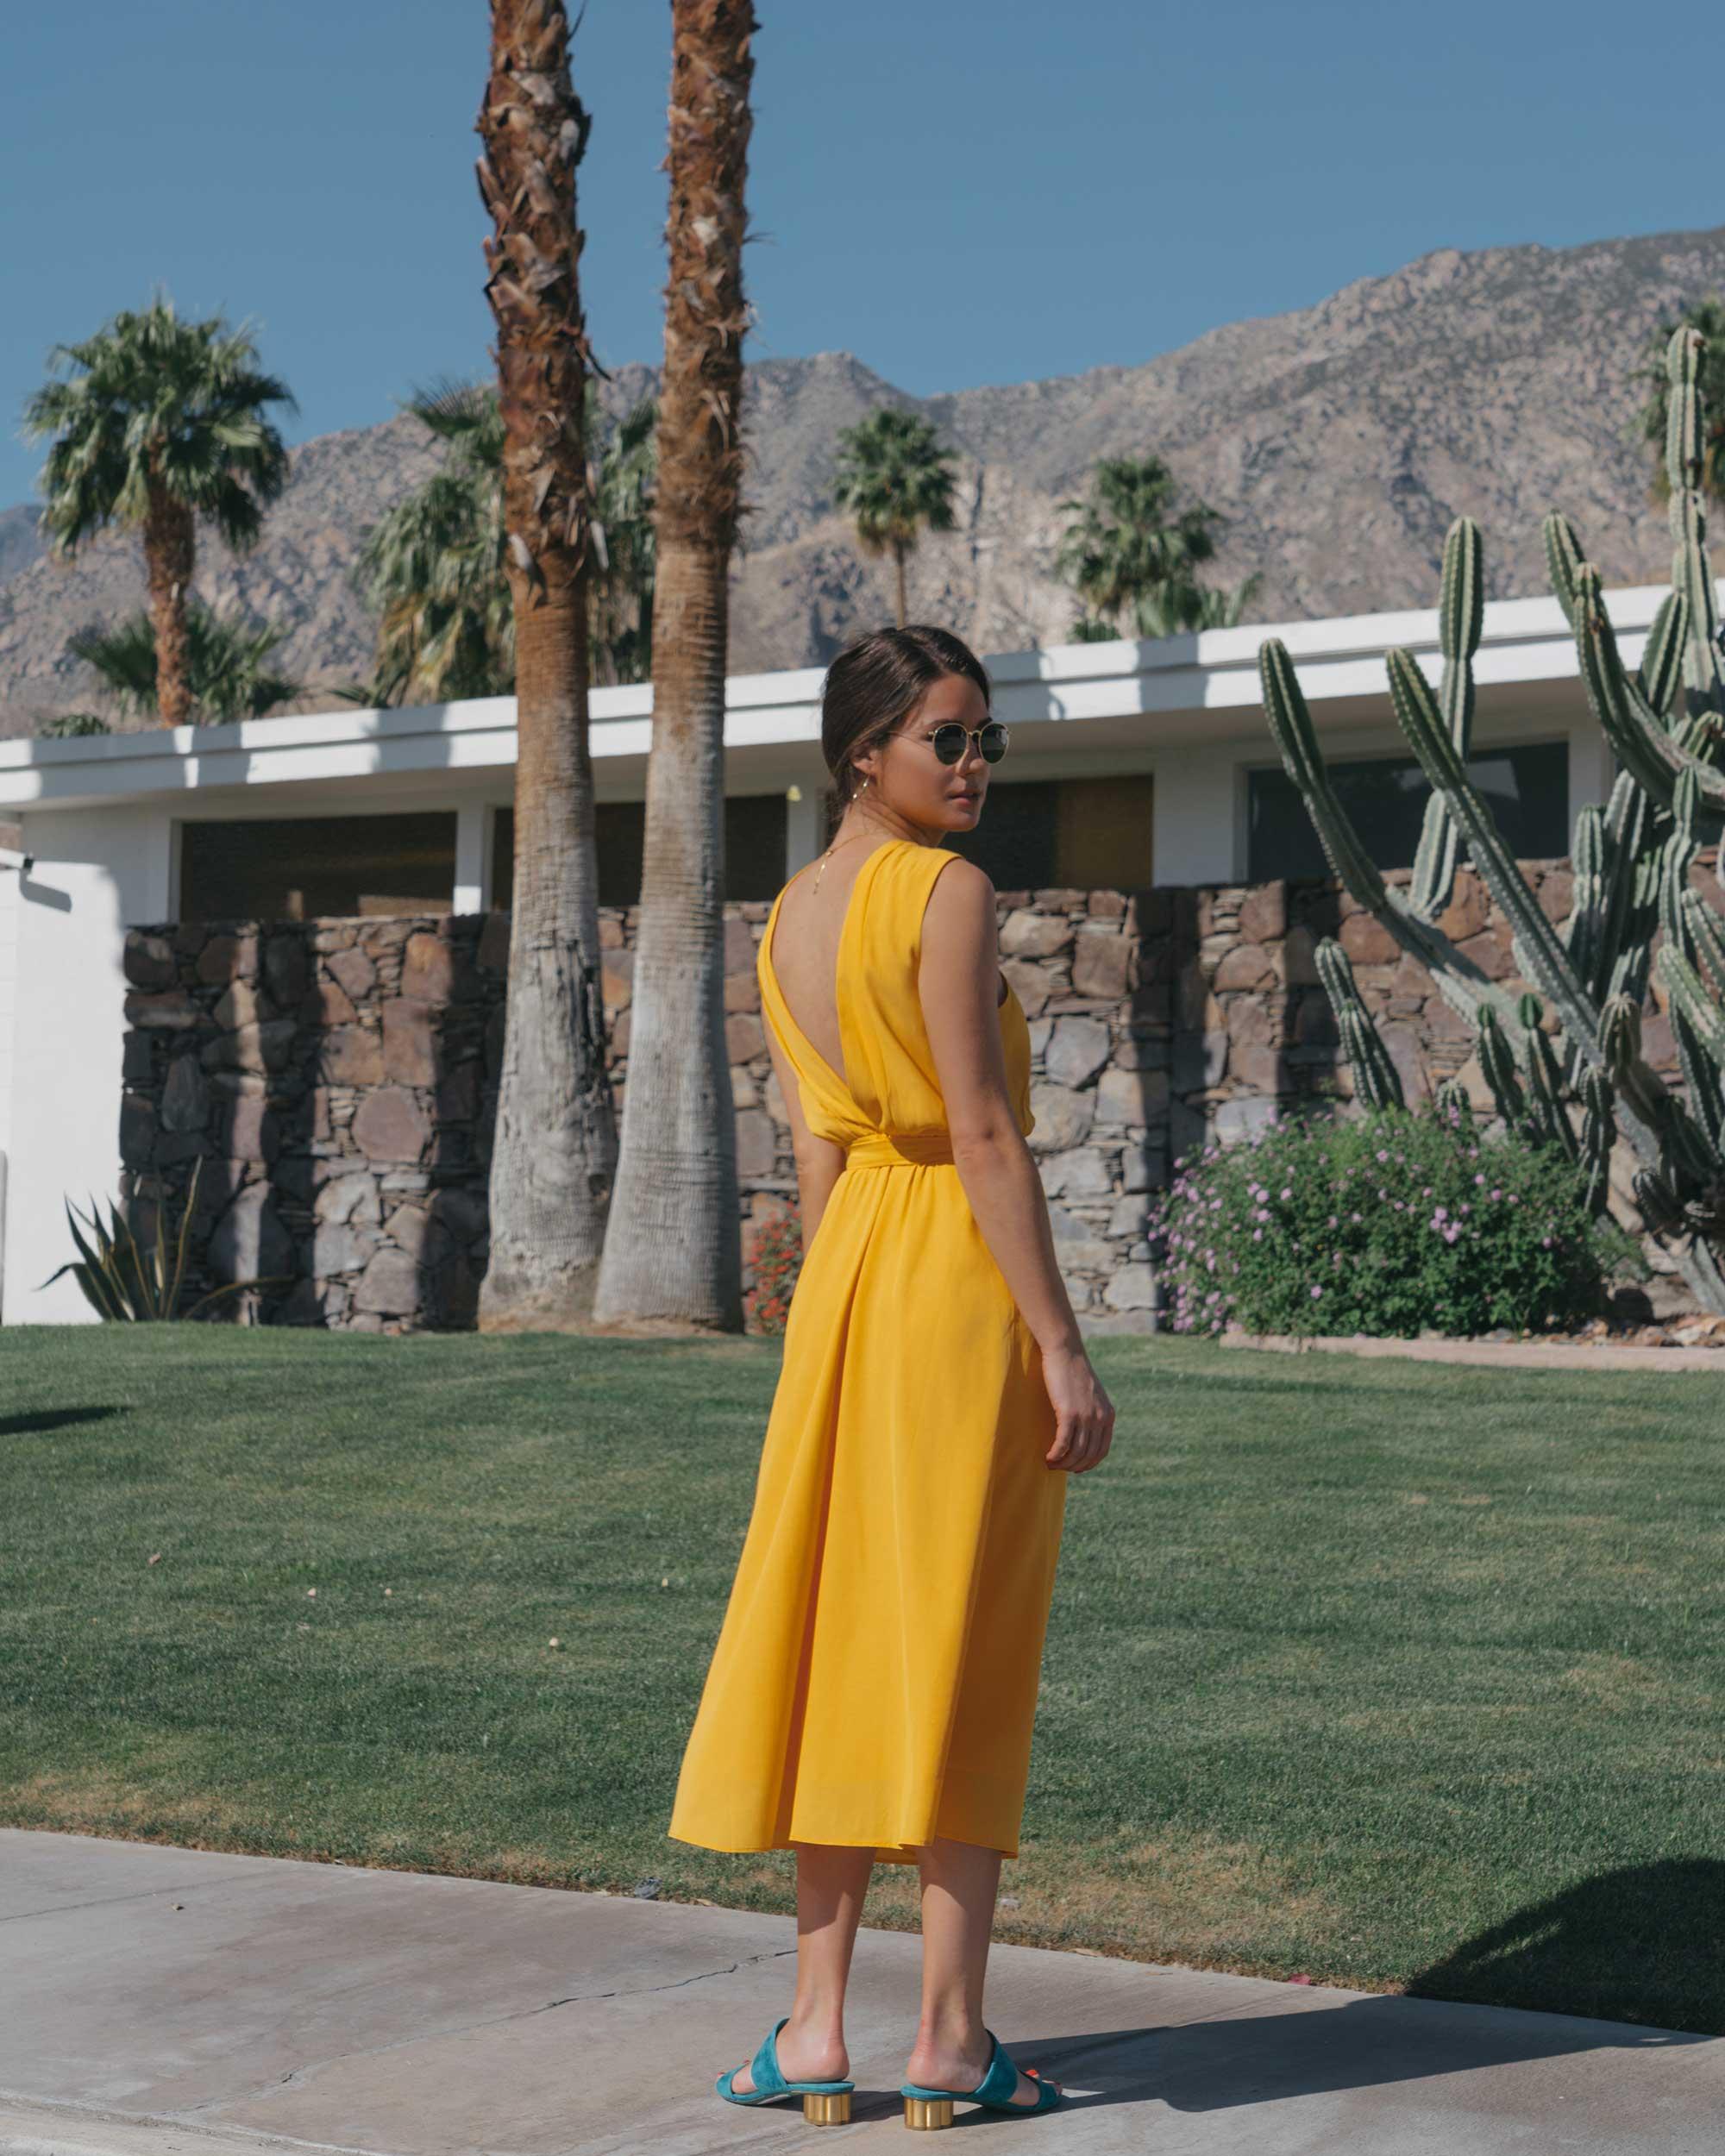 Feminine Yellow Cross Front Midi Dress Palm Springs Outfit11.jpg